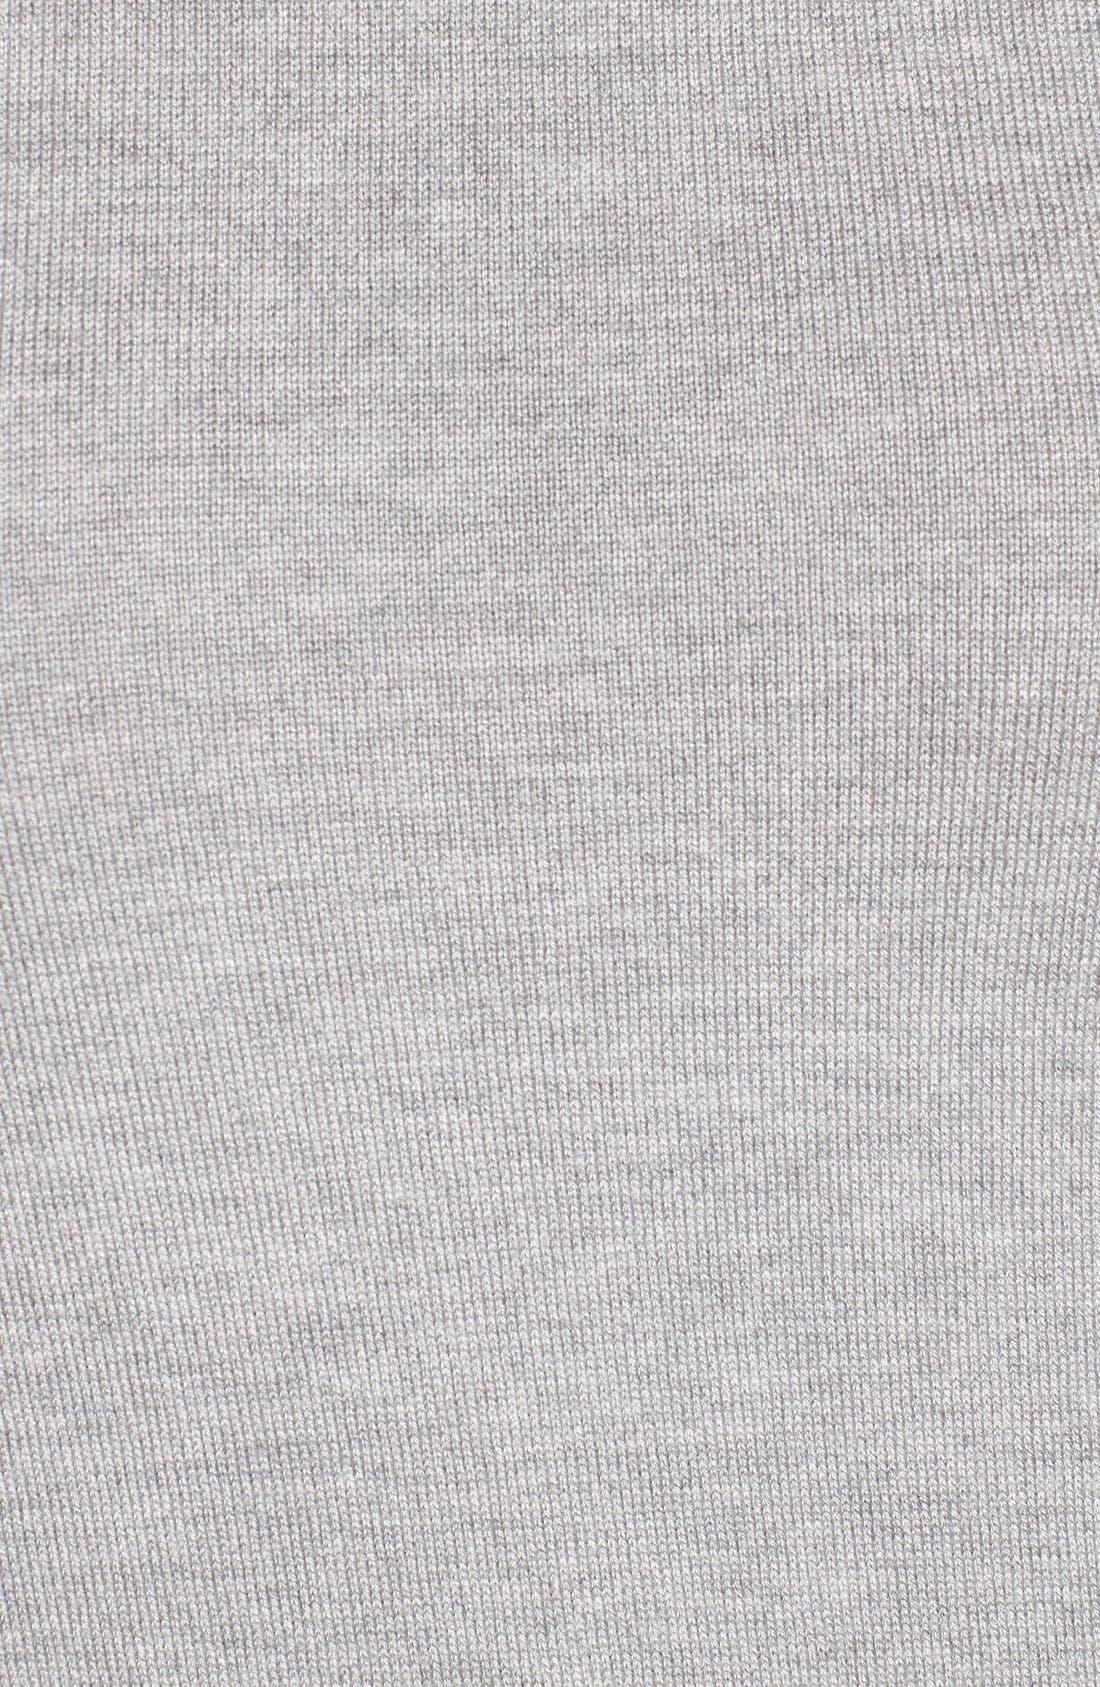 Cuff Detail Silk Blend Crewneck Sweater,                             Alternate thumbnail 5, color,                             030